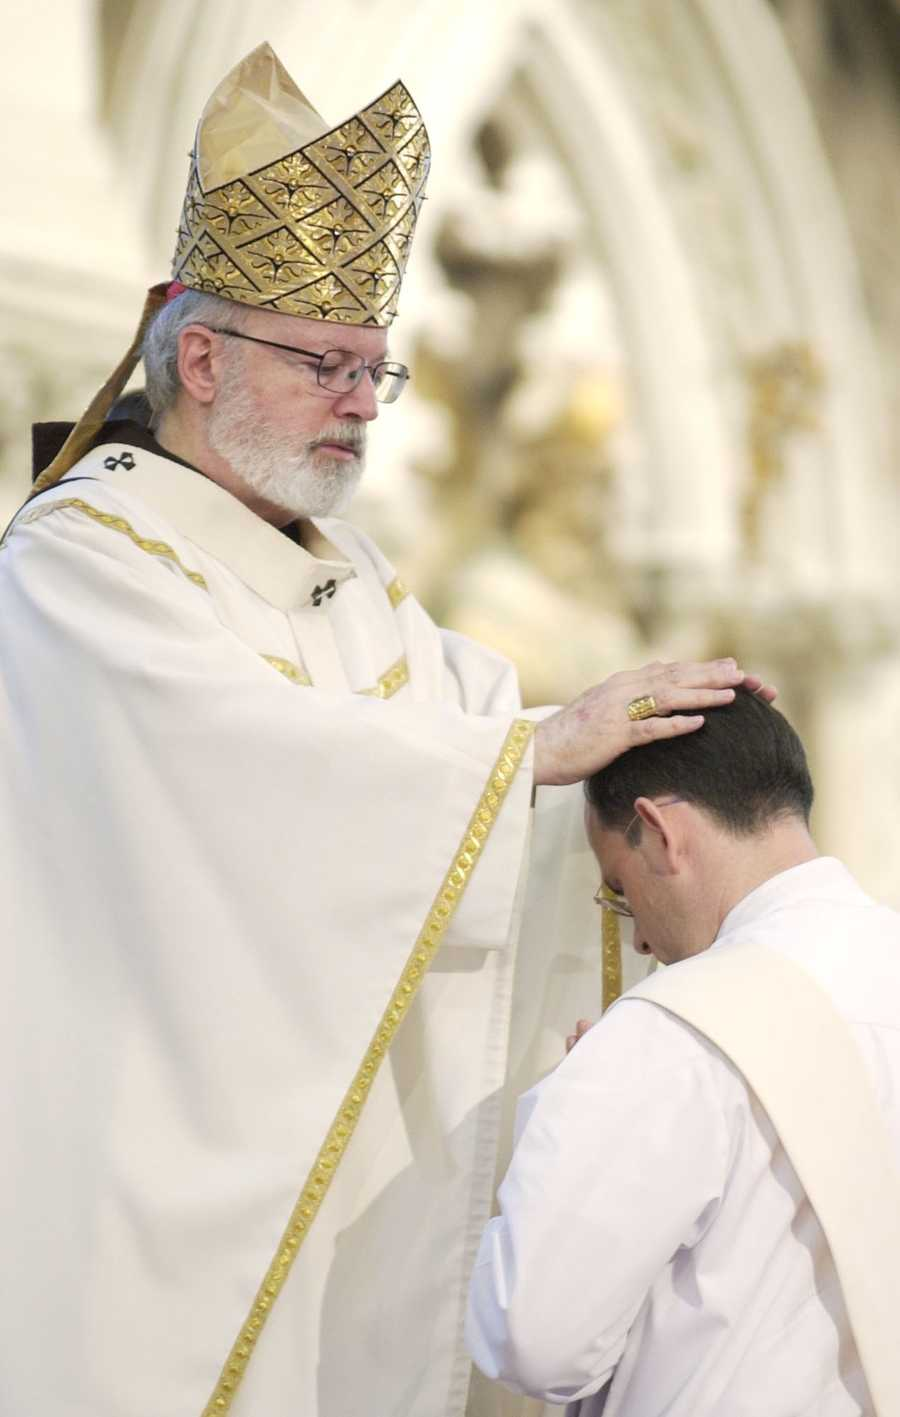 May 26, 2007: Cardinal Sean O'Malley ordains Father Andreas Davison